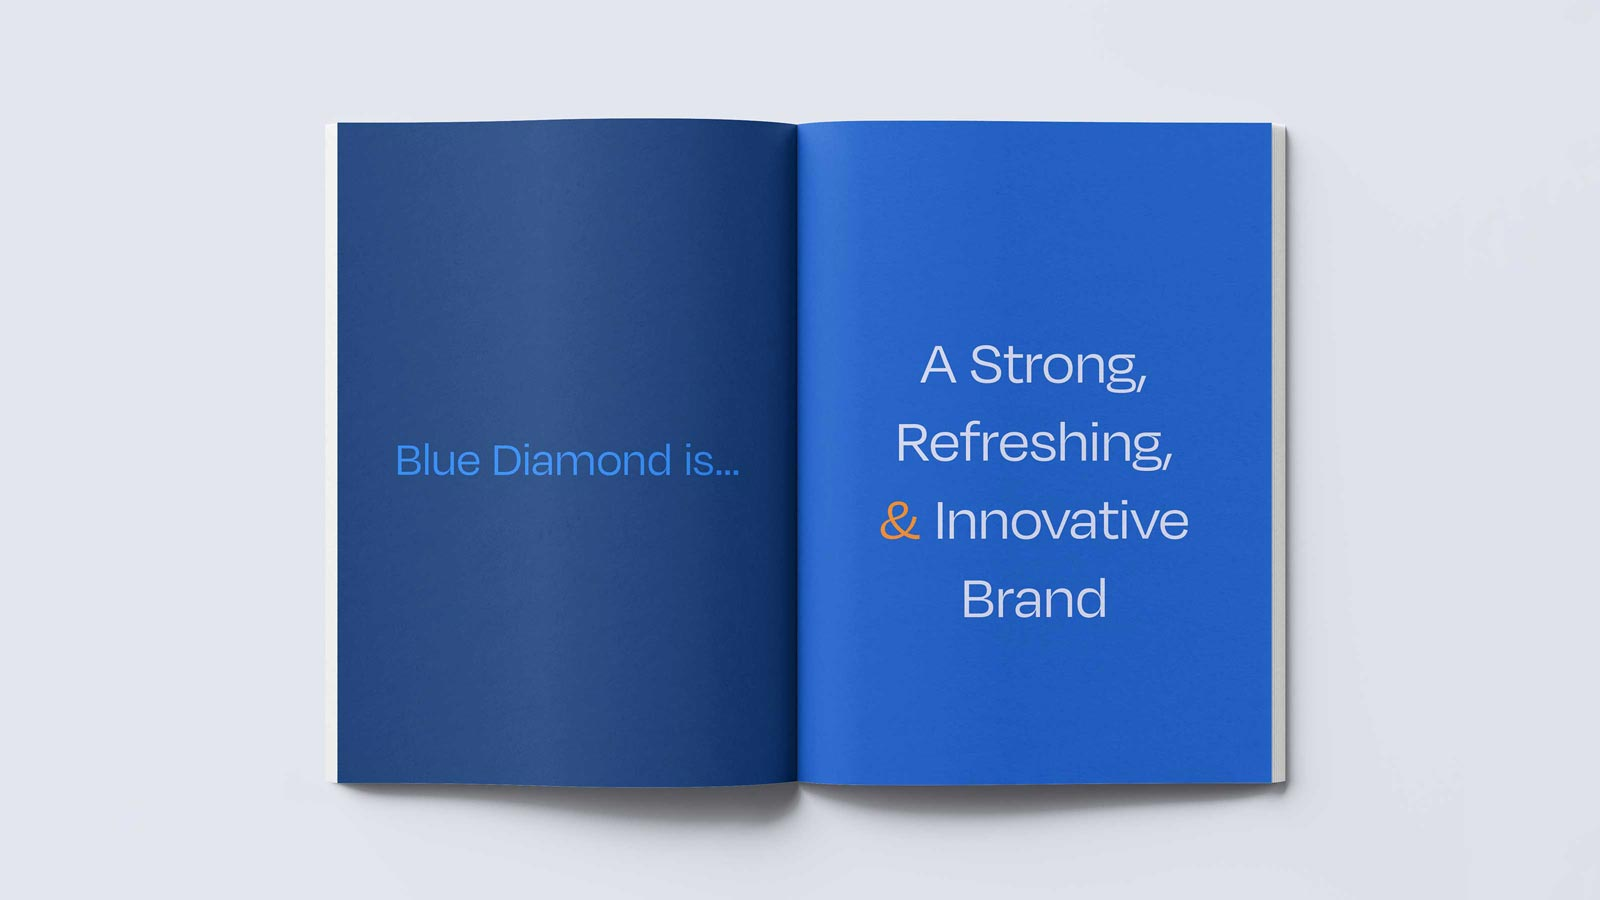 Blue Diamond blue book pages